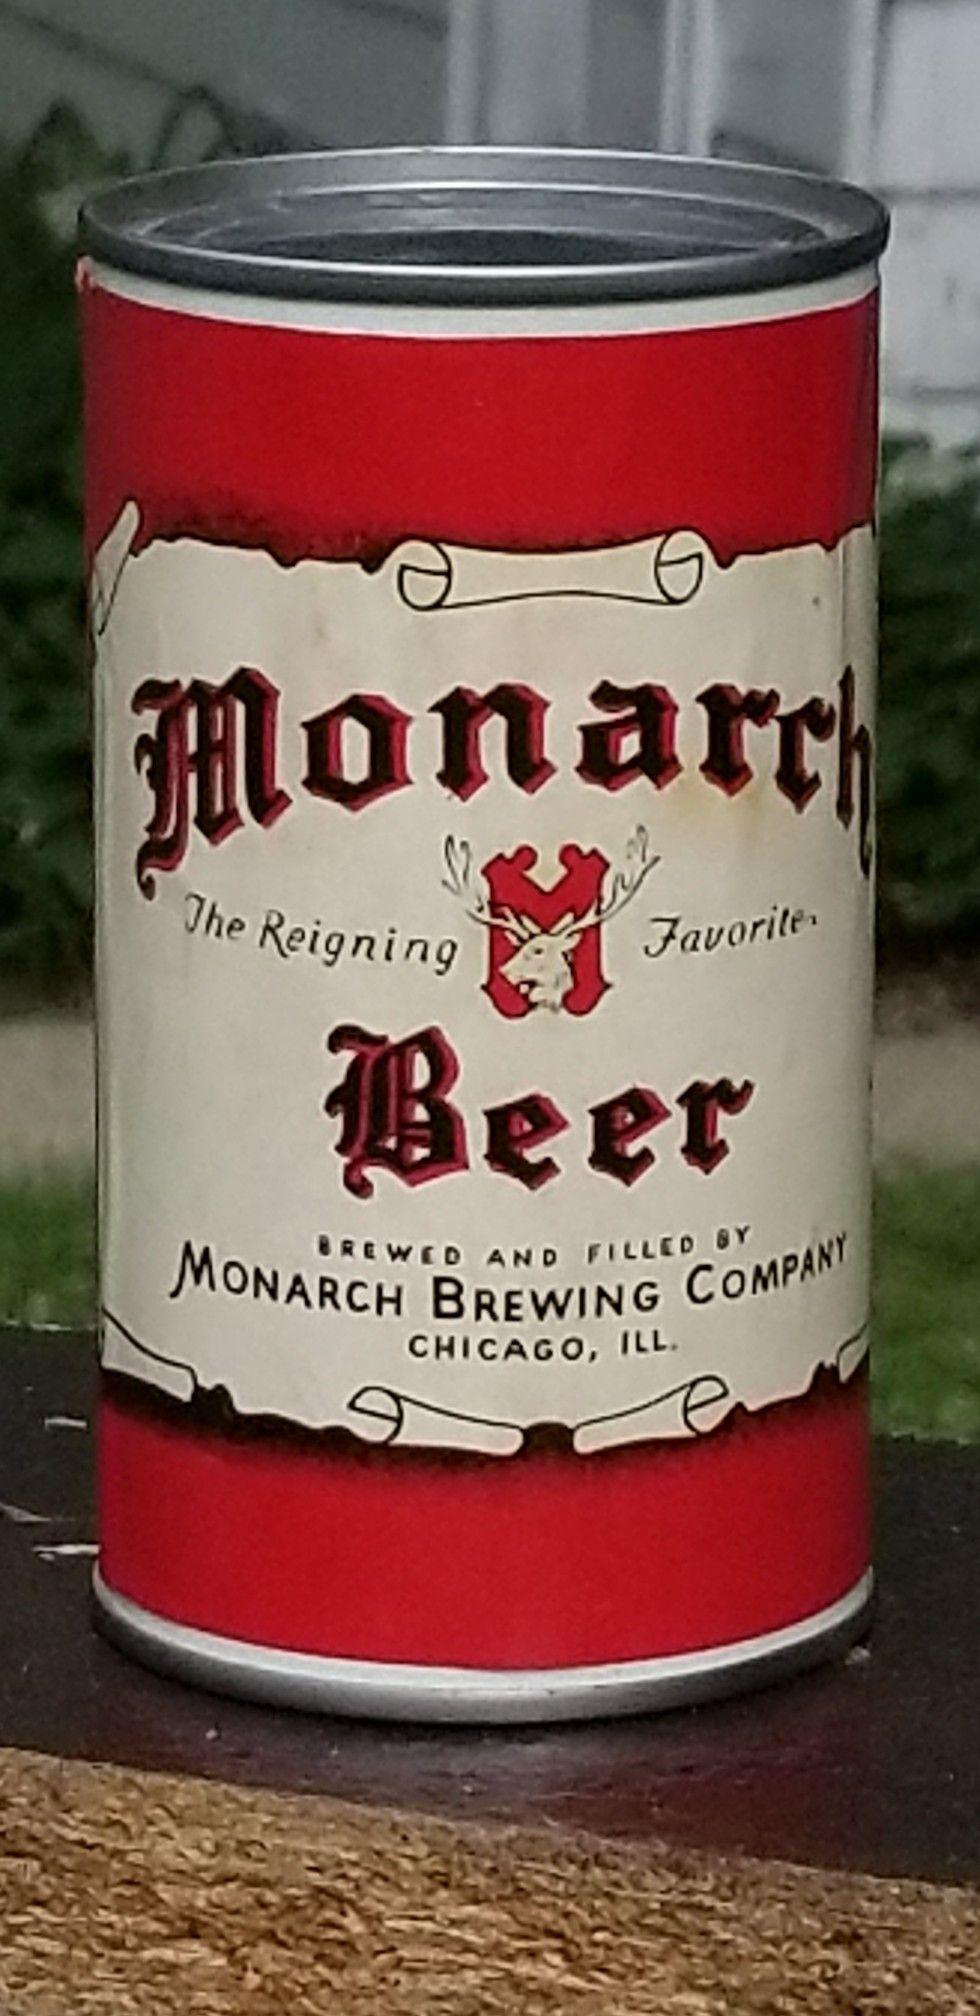 Monarch Beer Chicago Il 1954 Old Beer Cans Vintage Beer Beer Brands